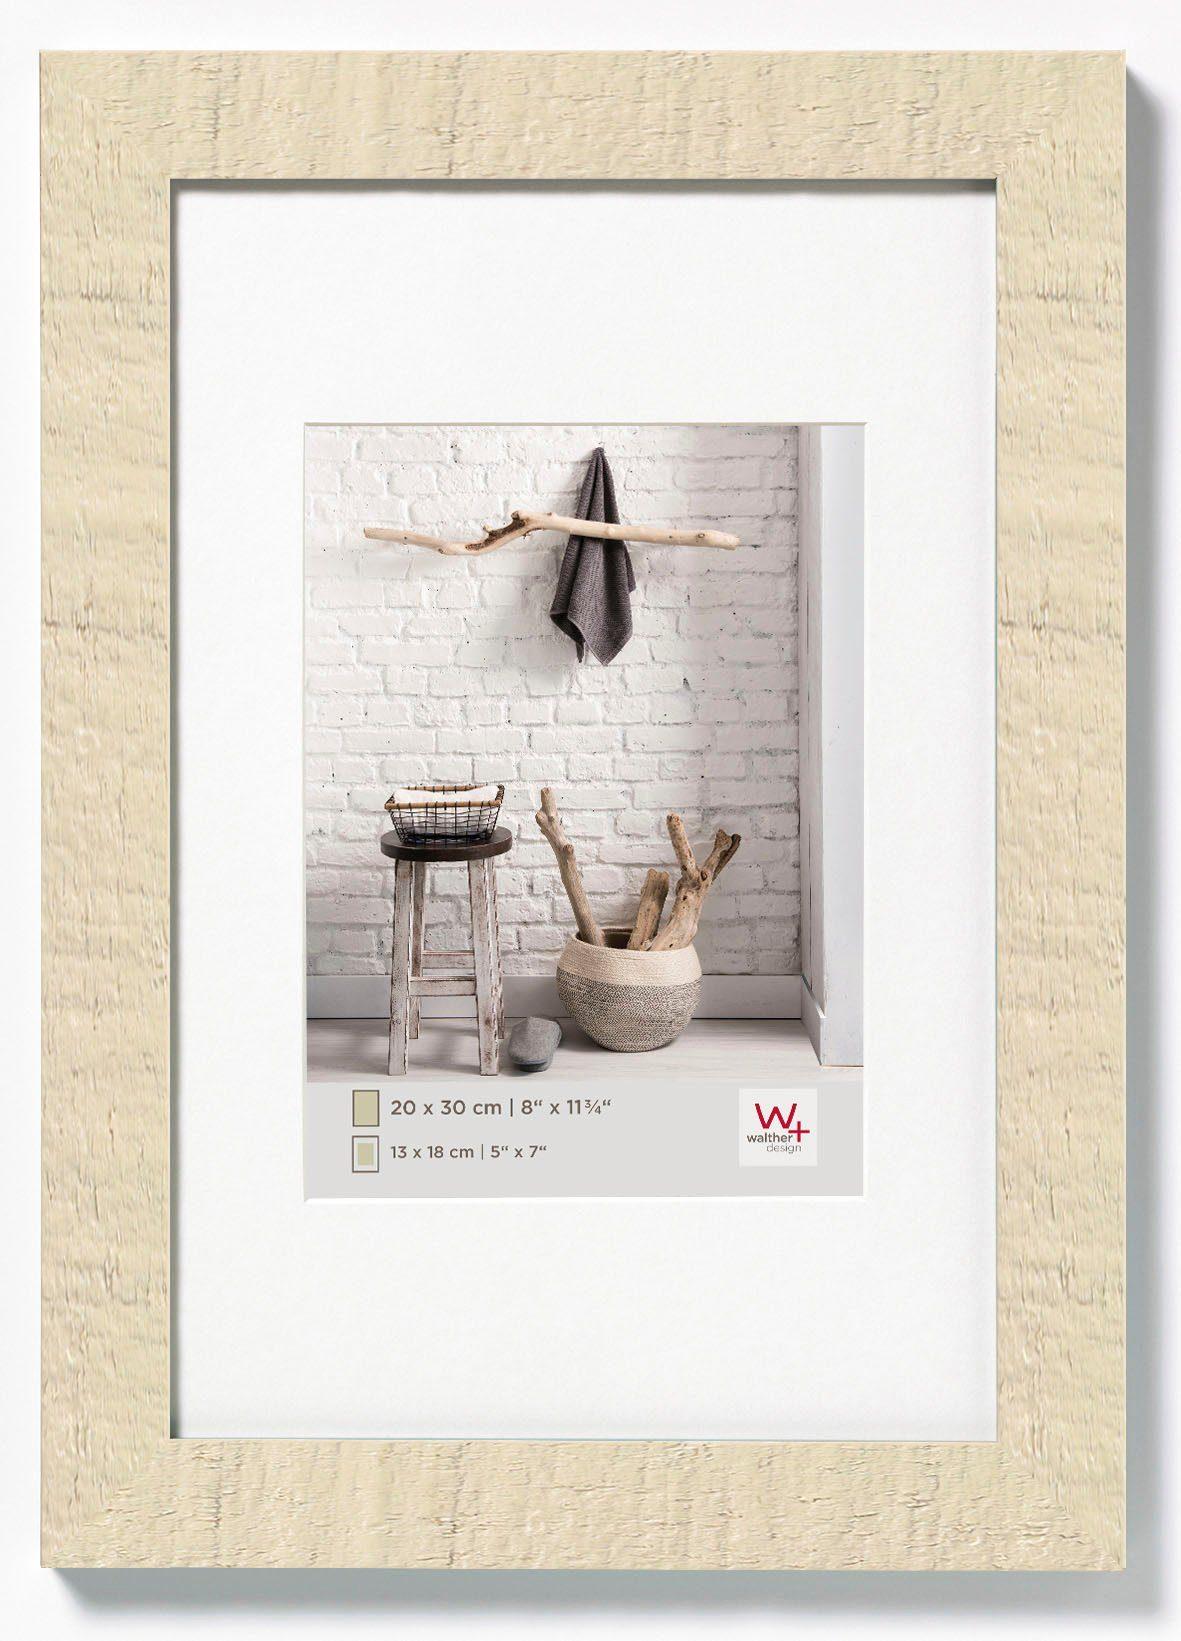 Walther Home Fotolijst Fotoformaat 21X29,7 cm (A4) Crème Wit online kopen